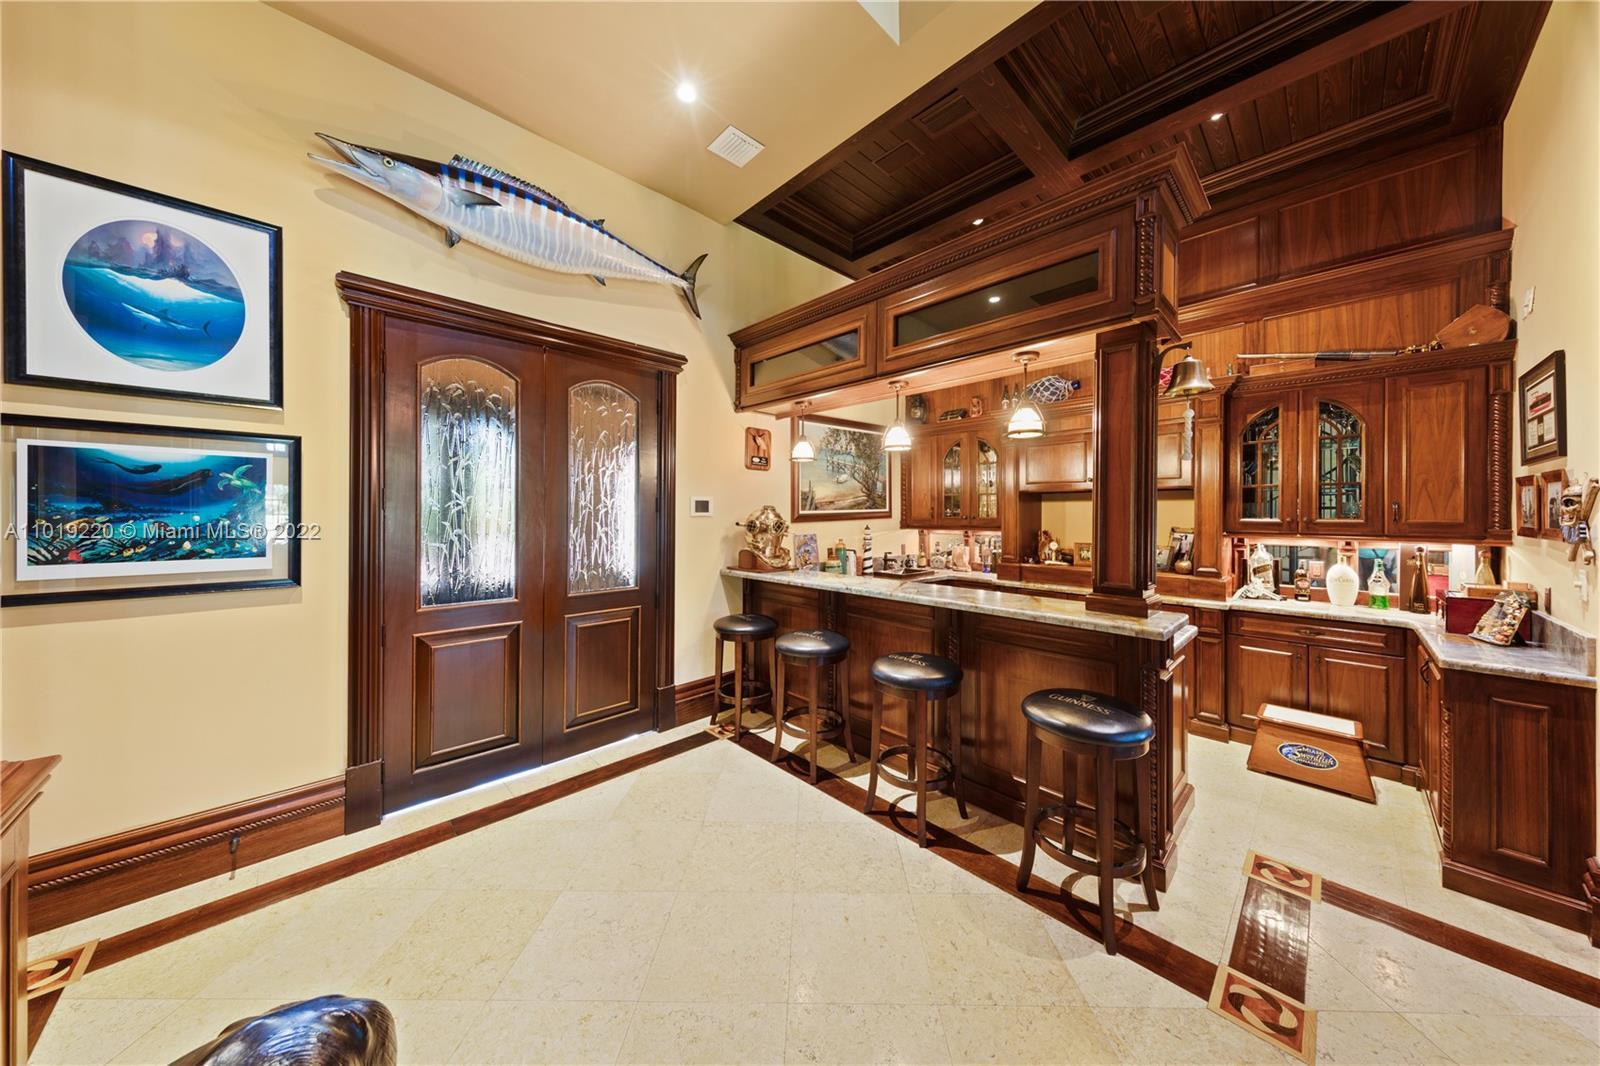 17201 Sw 248th St Property Photo 12